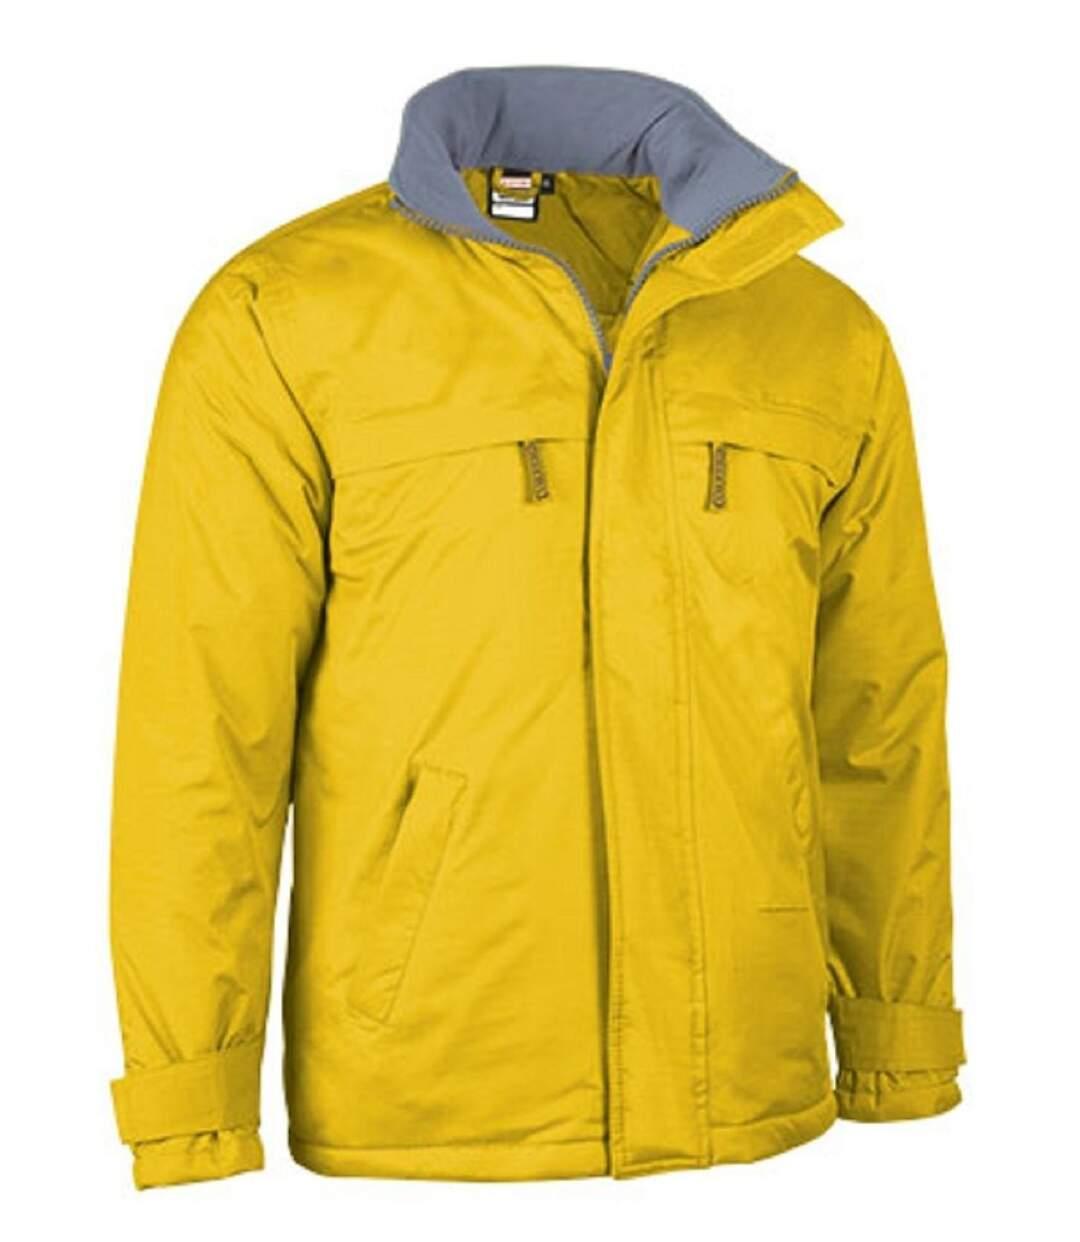 Parka - Homme - REF BOREAL - jaune